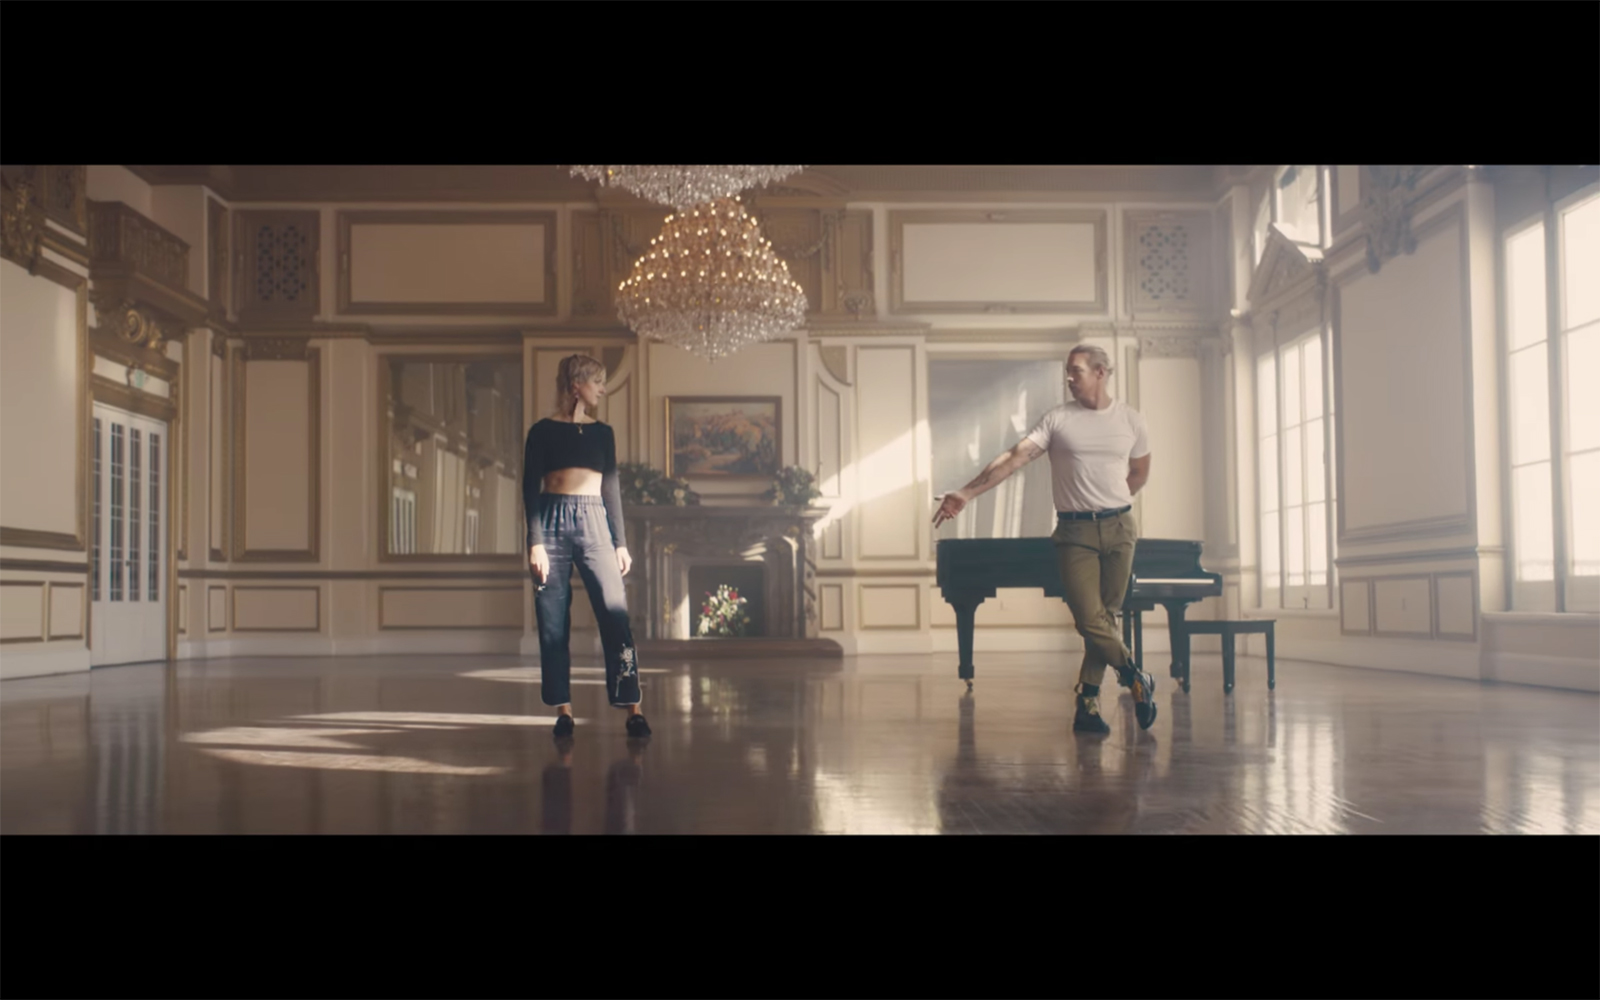 Moø and Diplo's music video Get It Right, filmed inside LA's former Alexandria Hotel